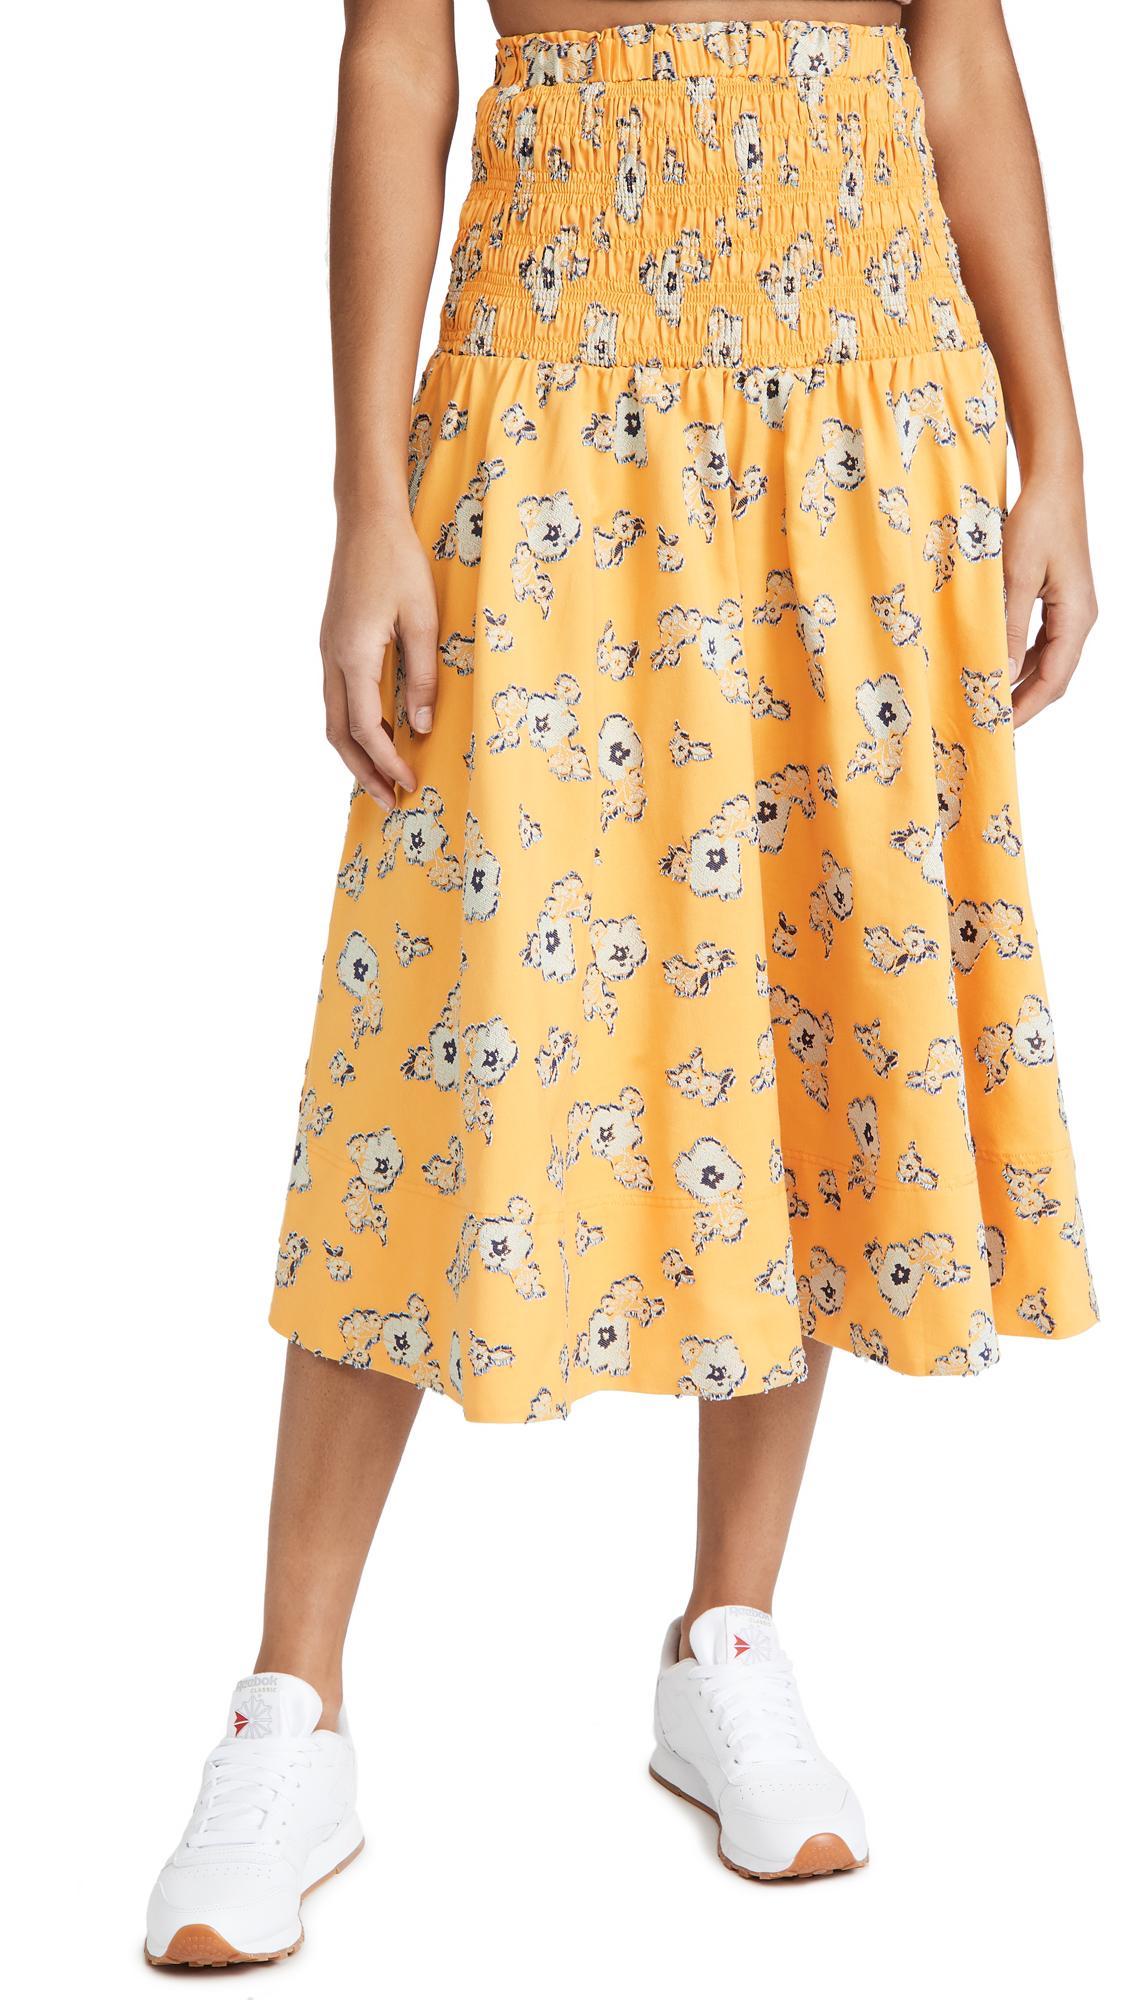 Tanya Taylor Lyla Floral Smocked Midi Skirt In Scattered Blossom Marigold